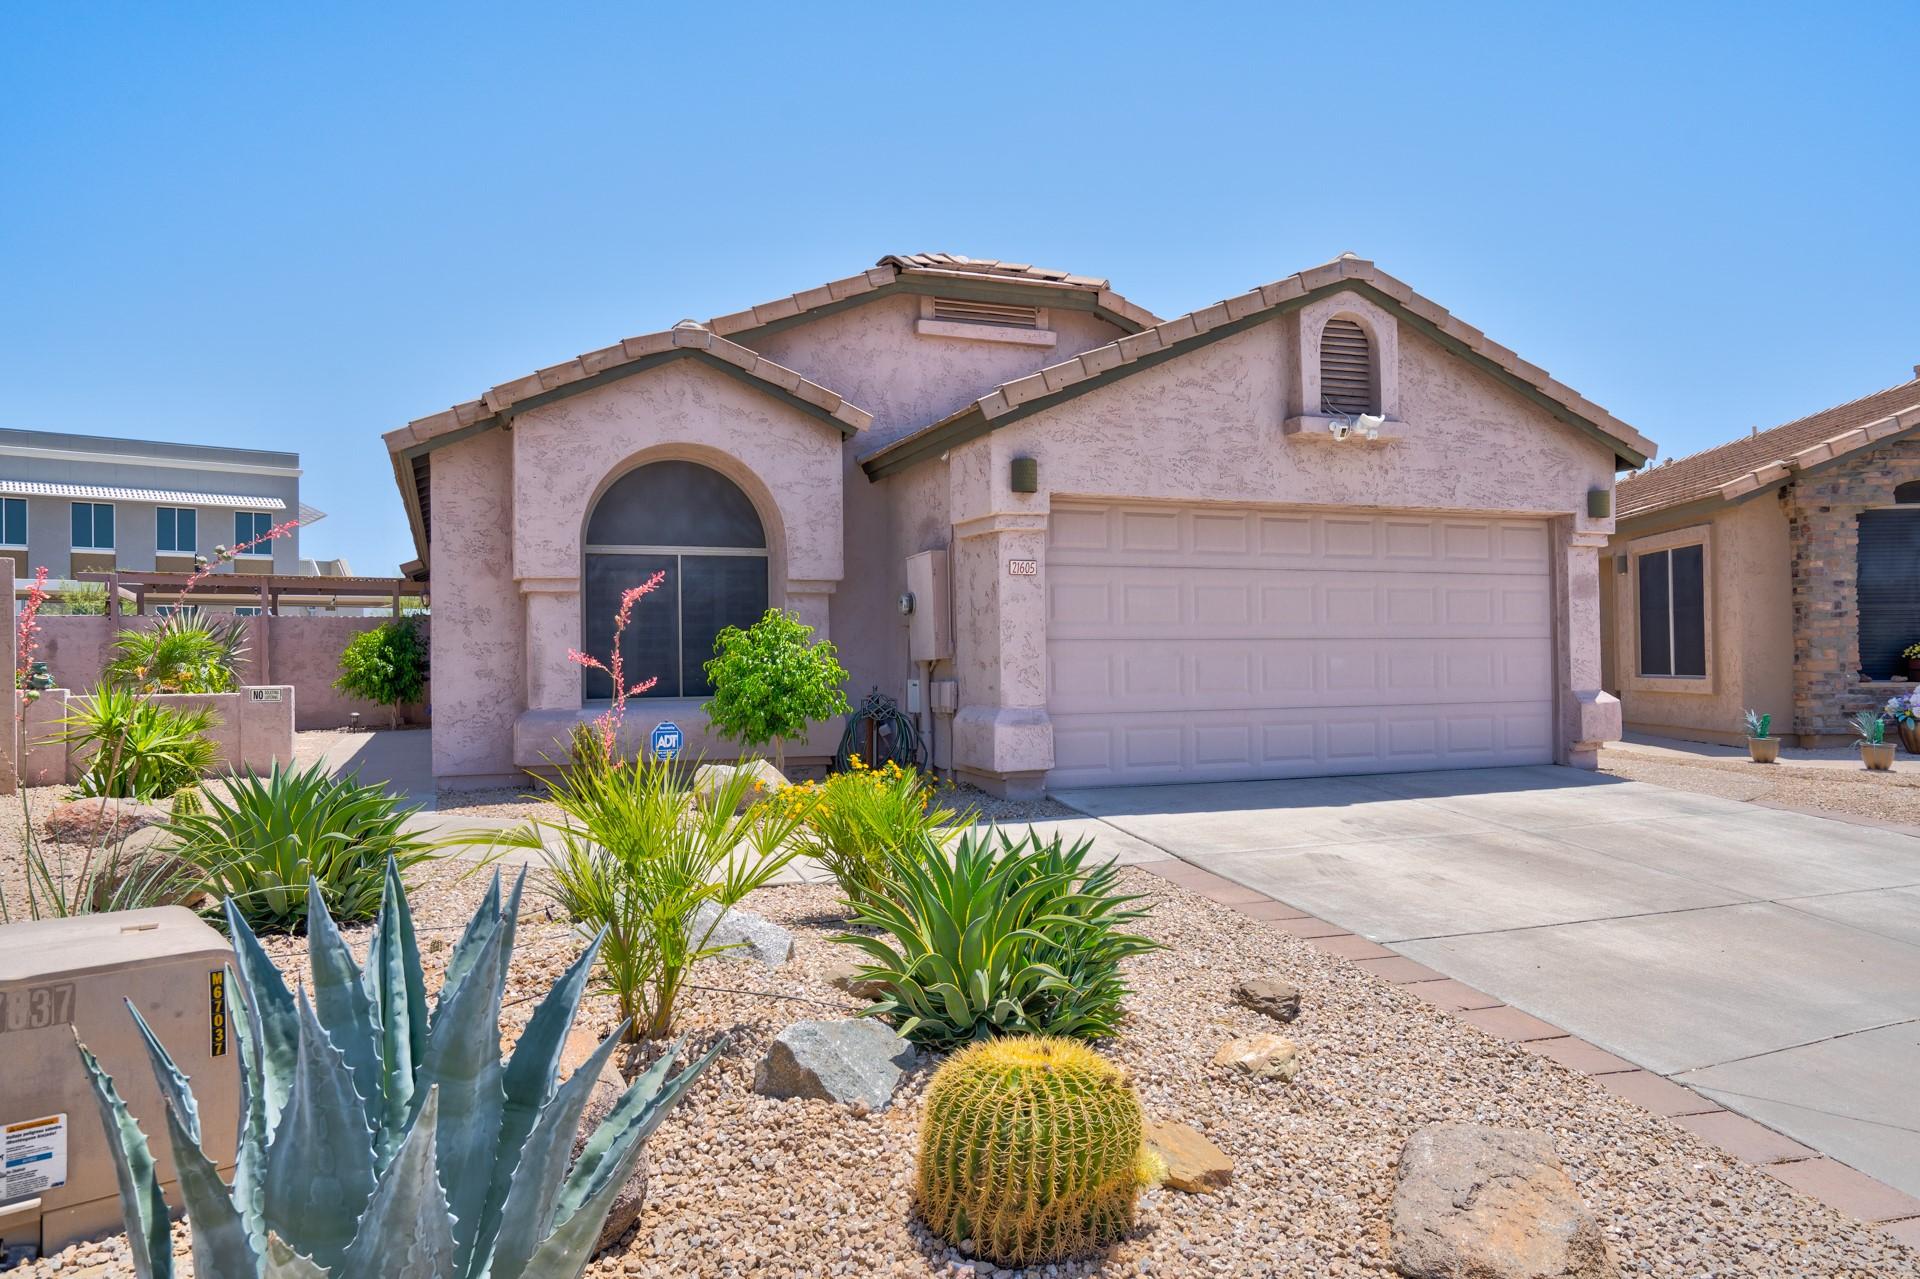 21605 N 48th Pl, Phoenix, AZ 85054